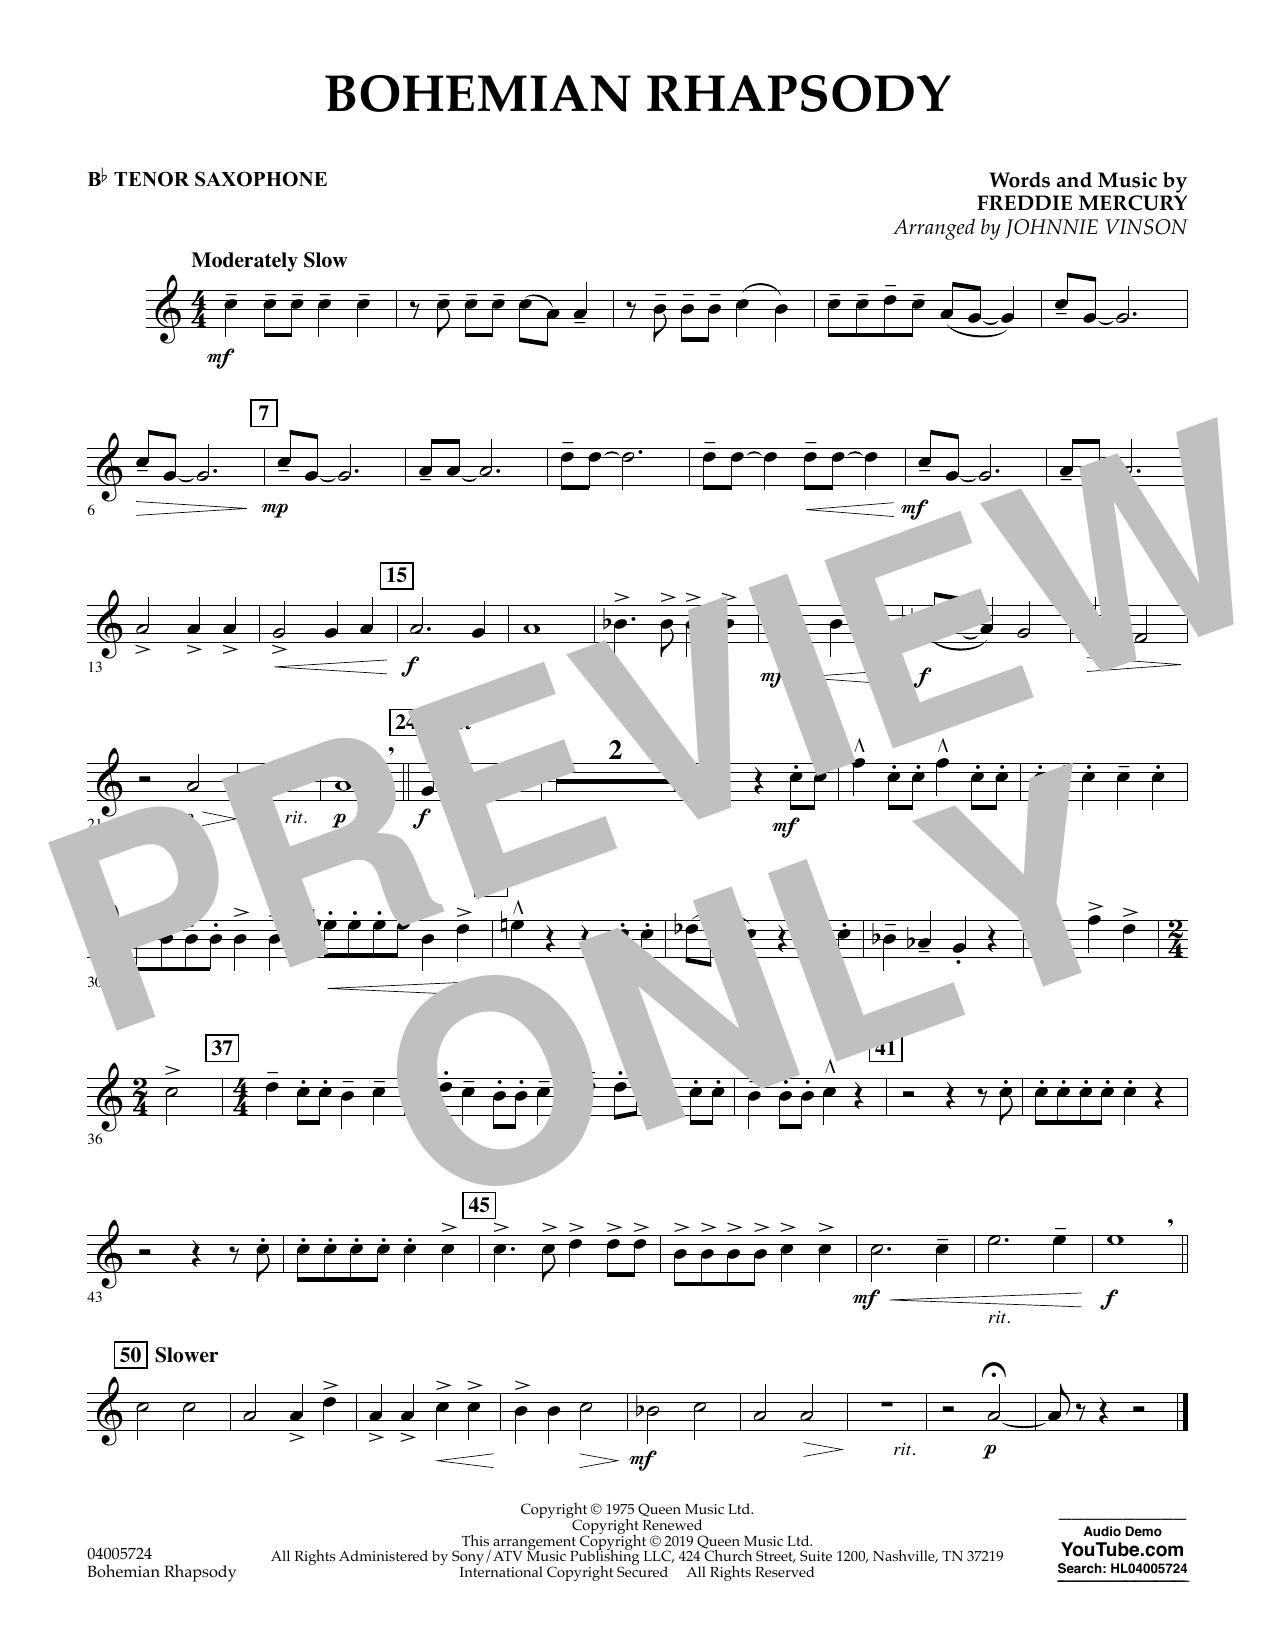 Bohemian Rhapsody (arr. Johnnie Vinson) - Bb Tenor Saxophone (Concert Band)